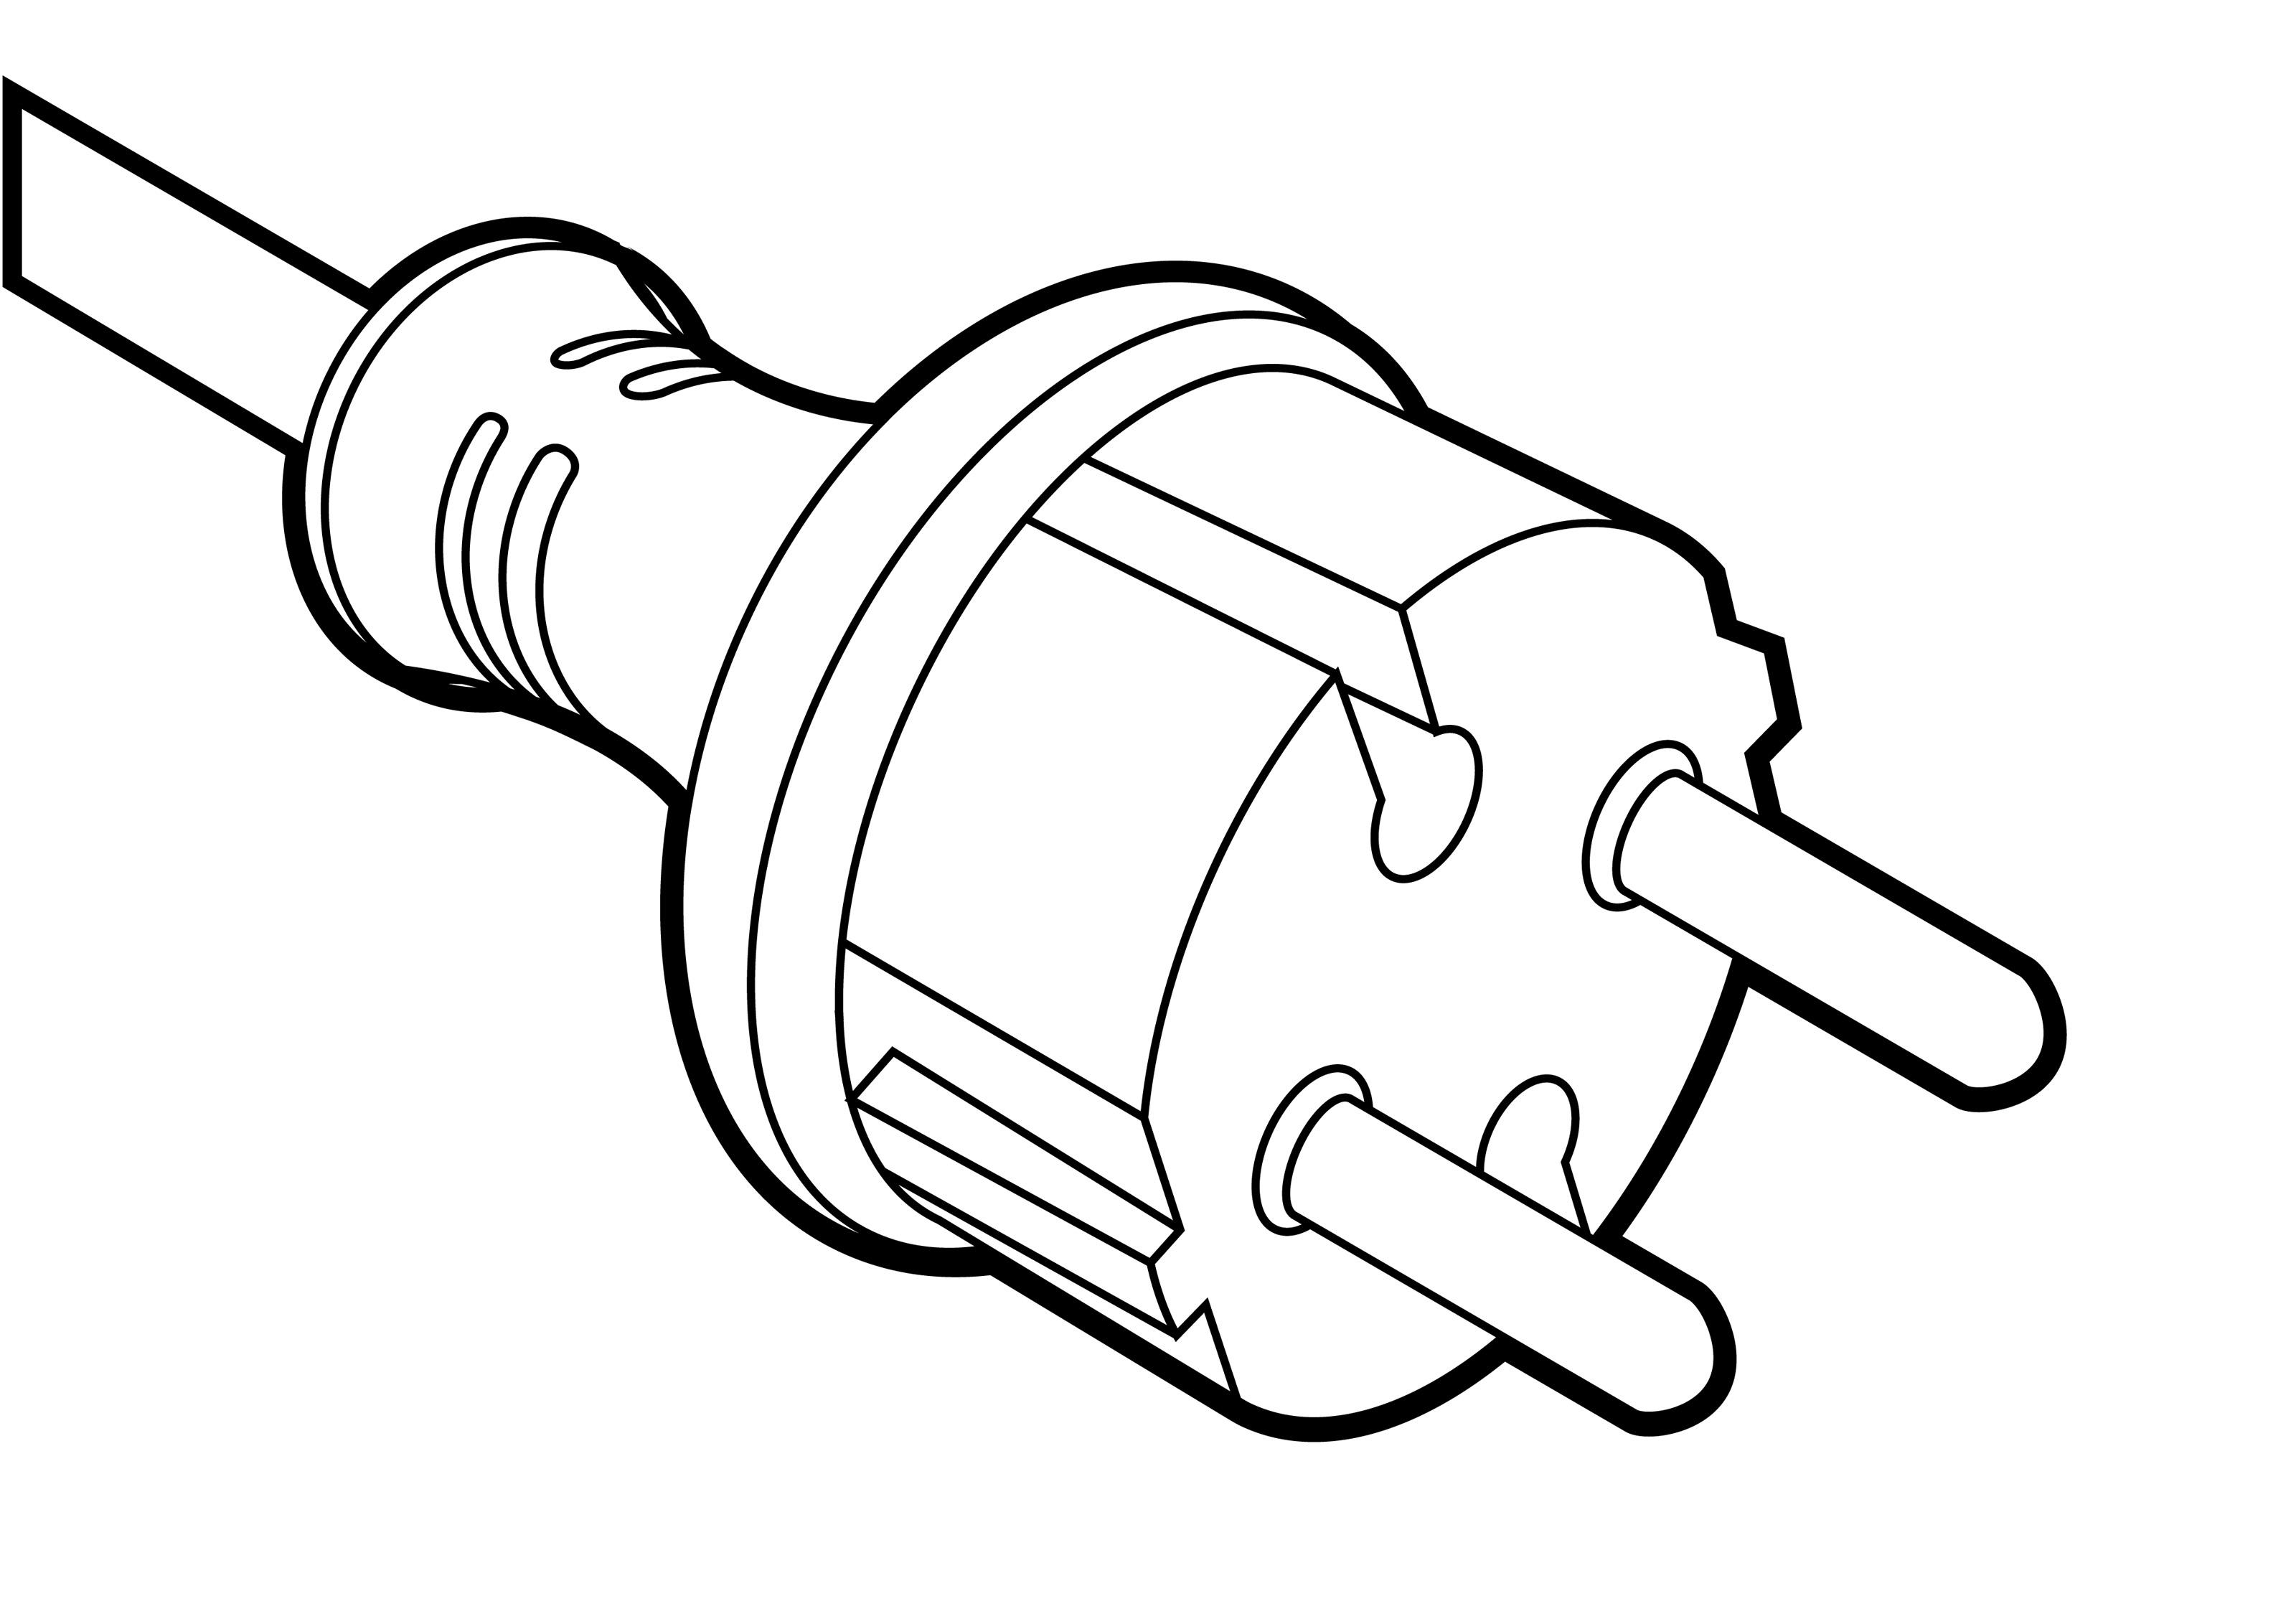 3200x2263 Power Cord Outline Vector Illustration